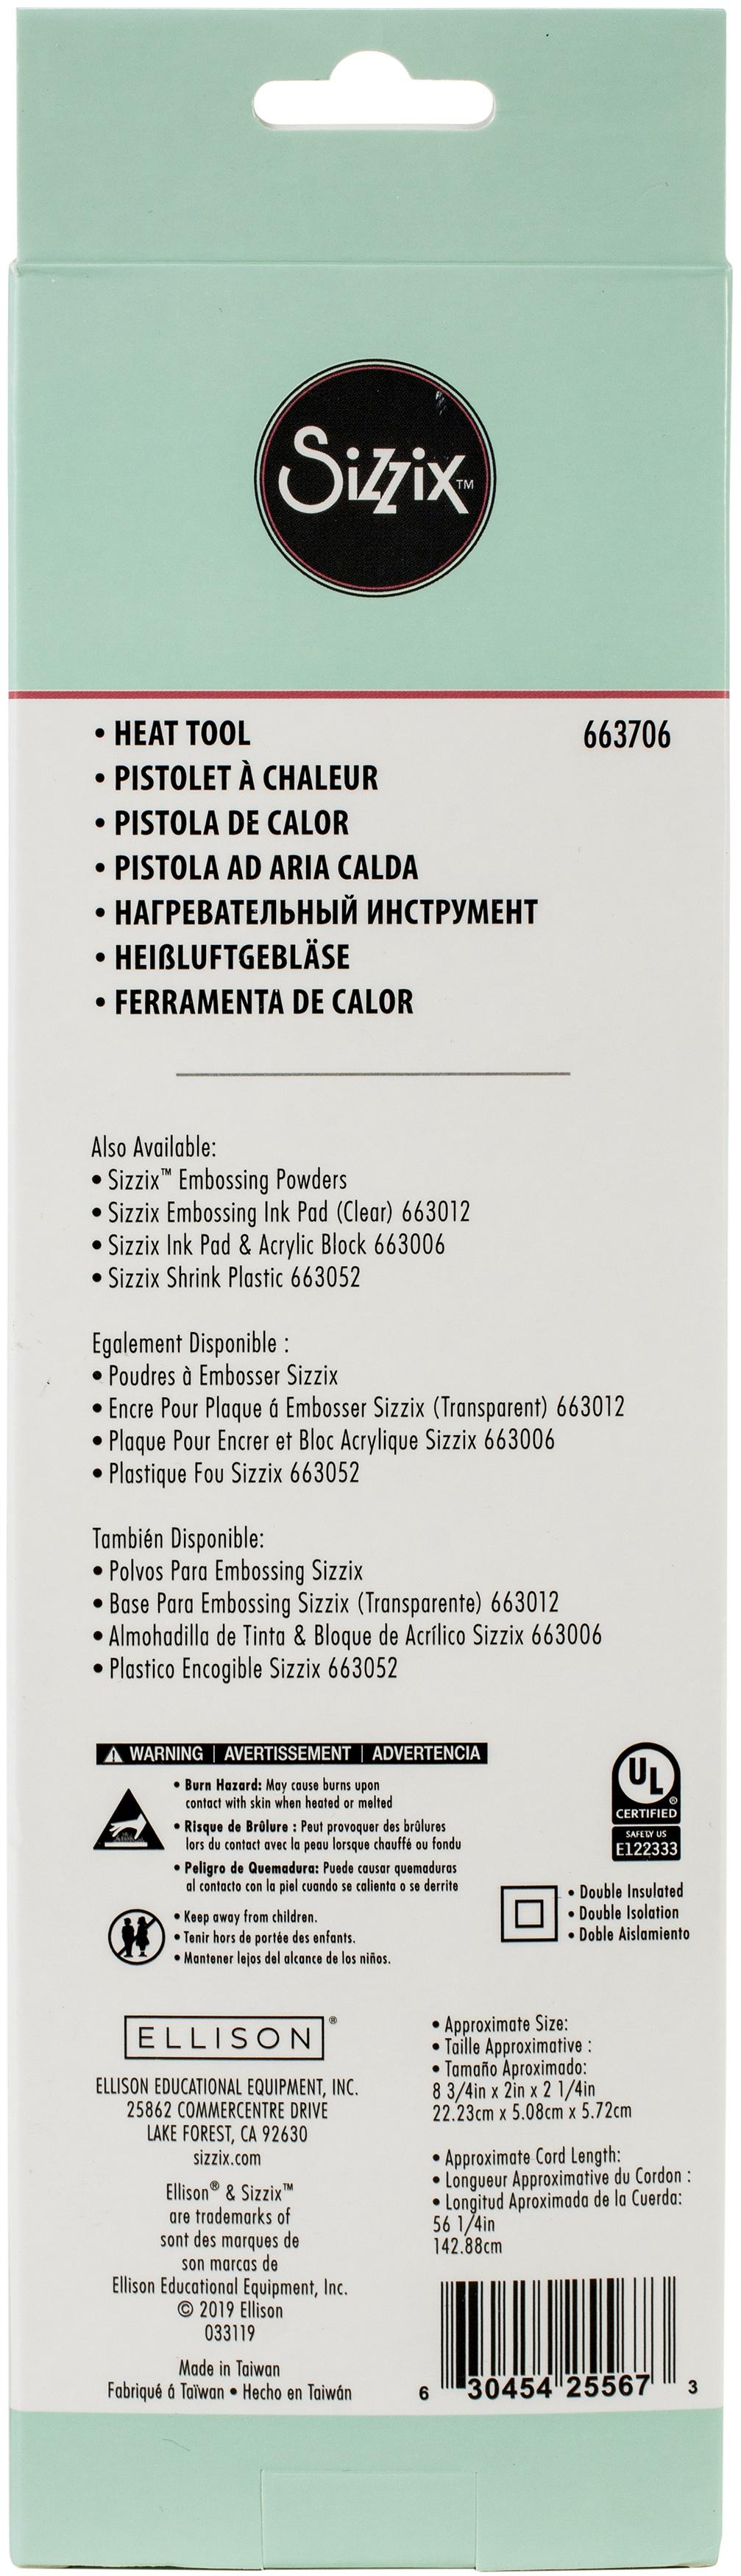 Sizzix Heating Tool US Version-